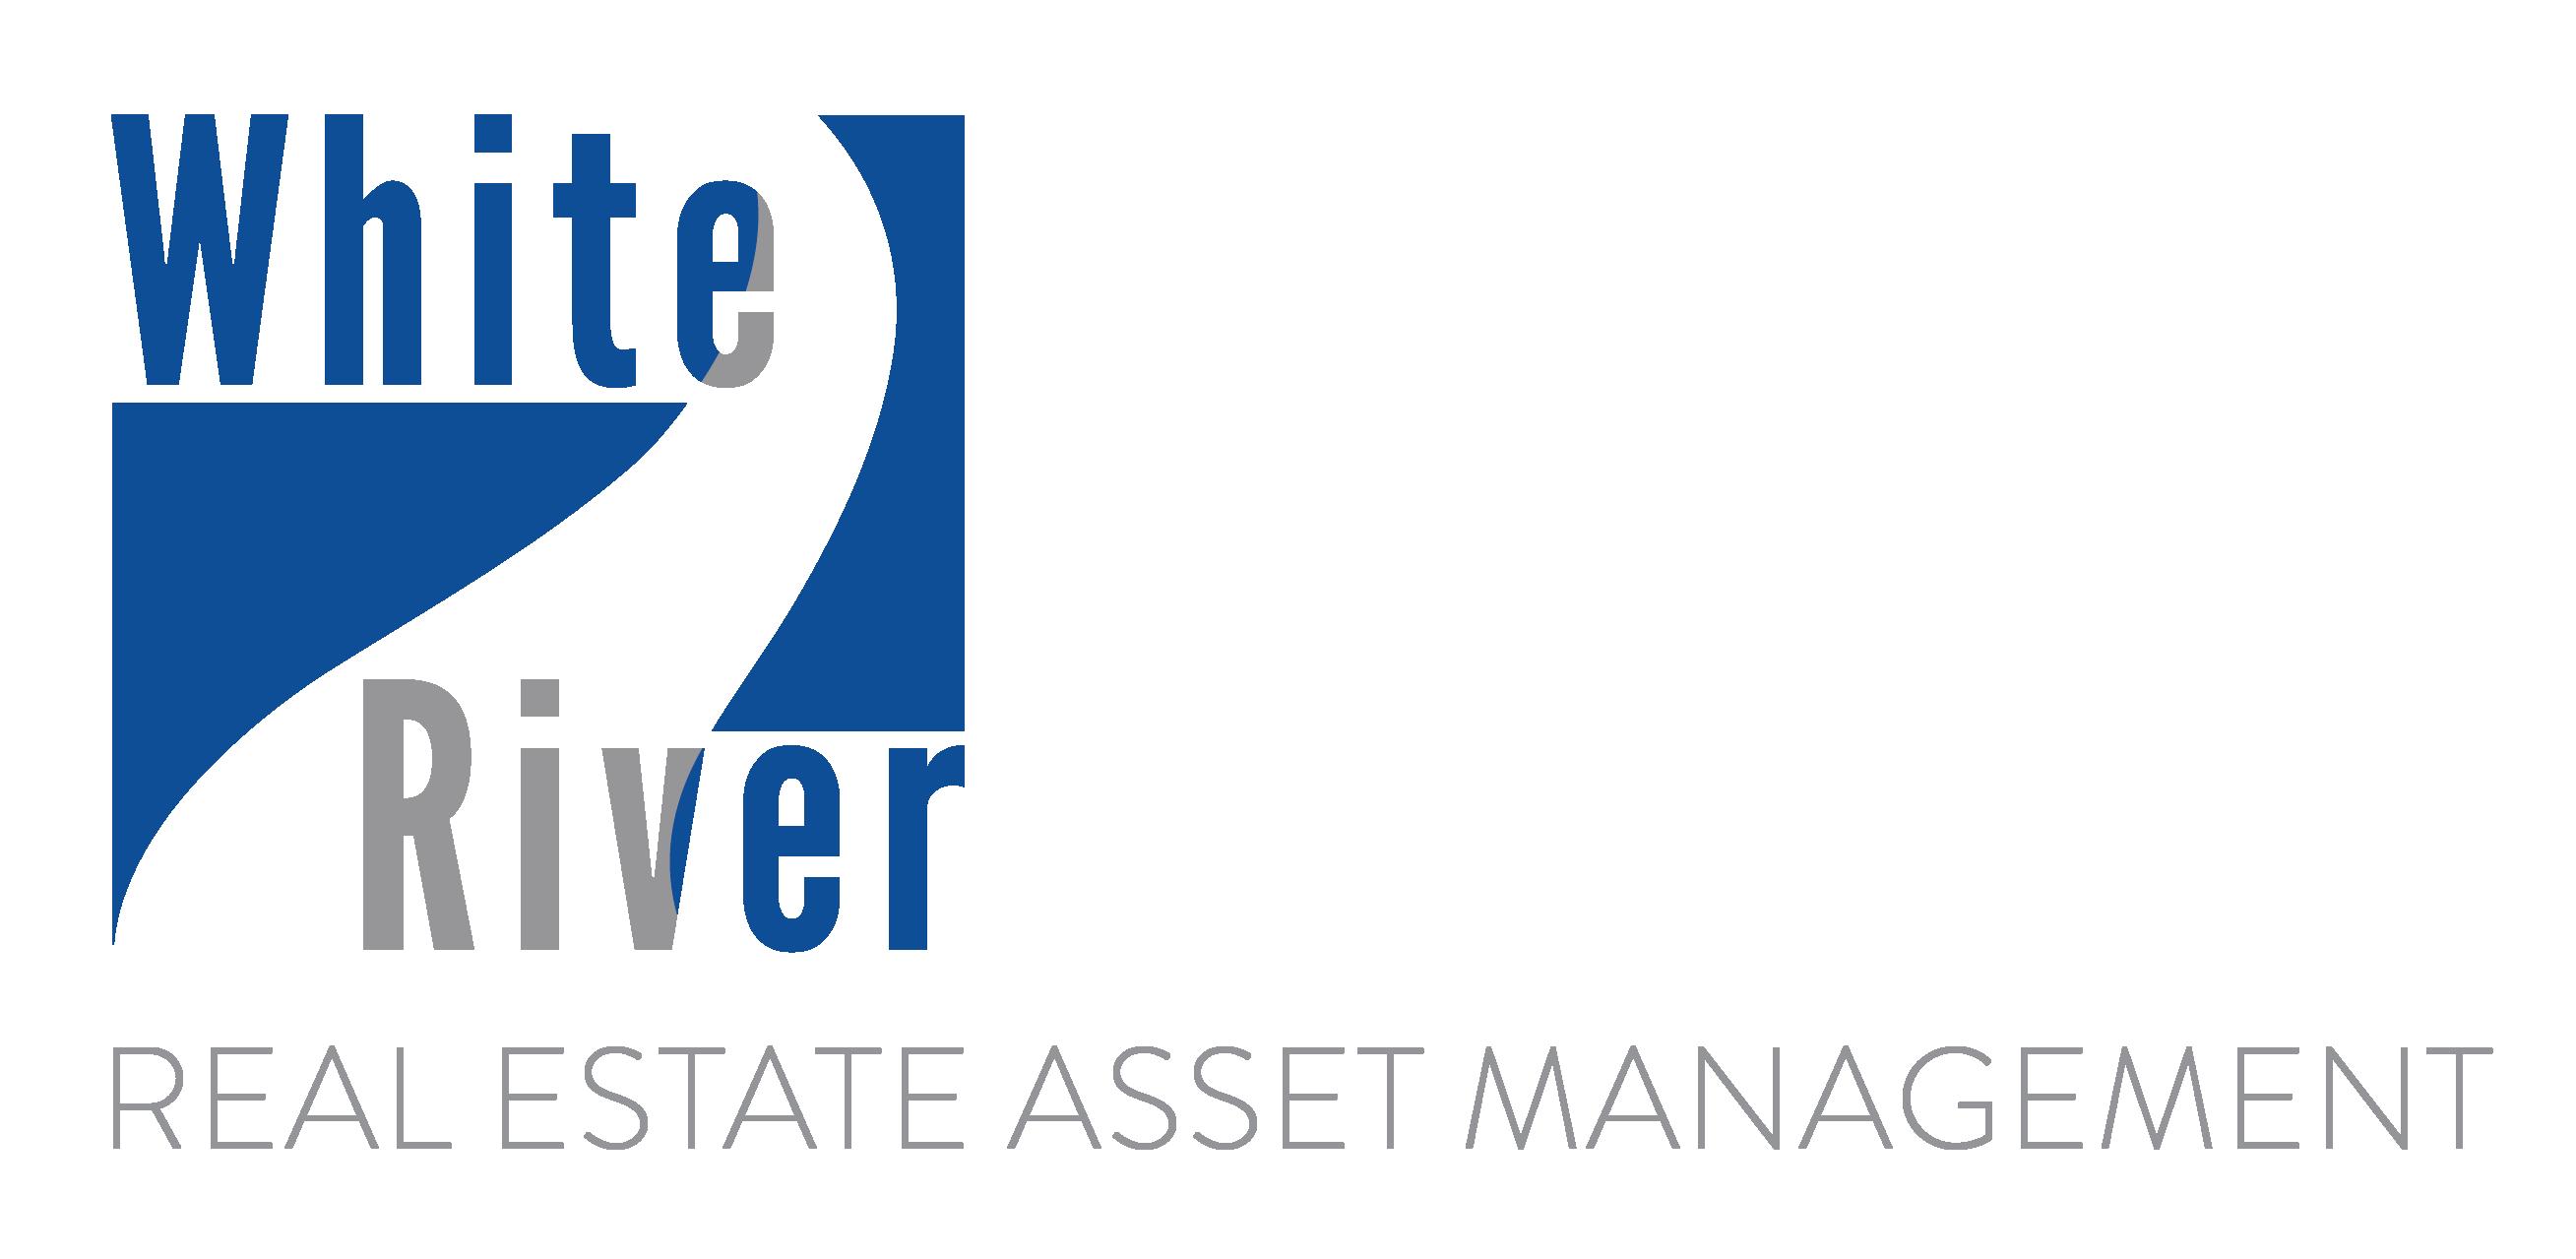 White River - Real Estate Asset Management